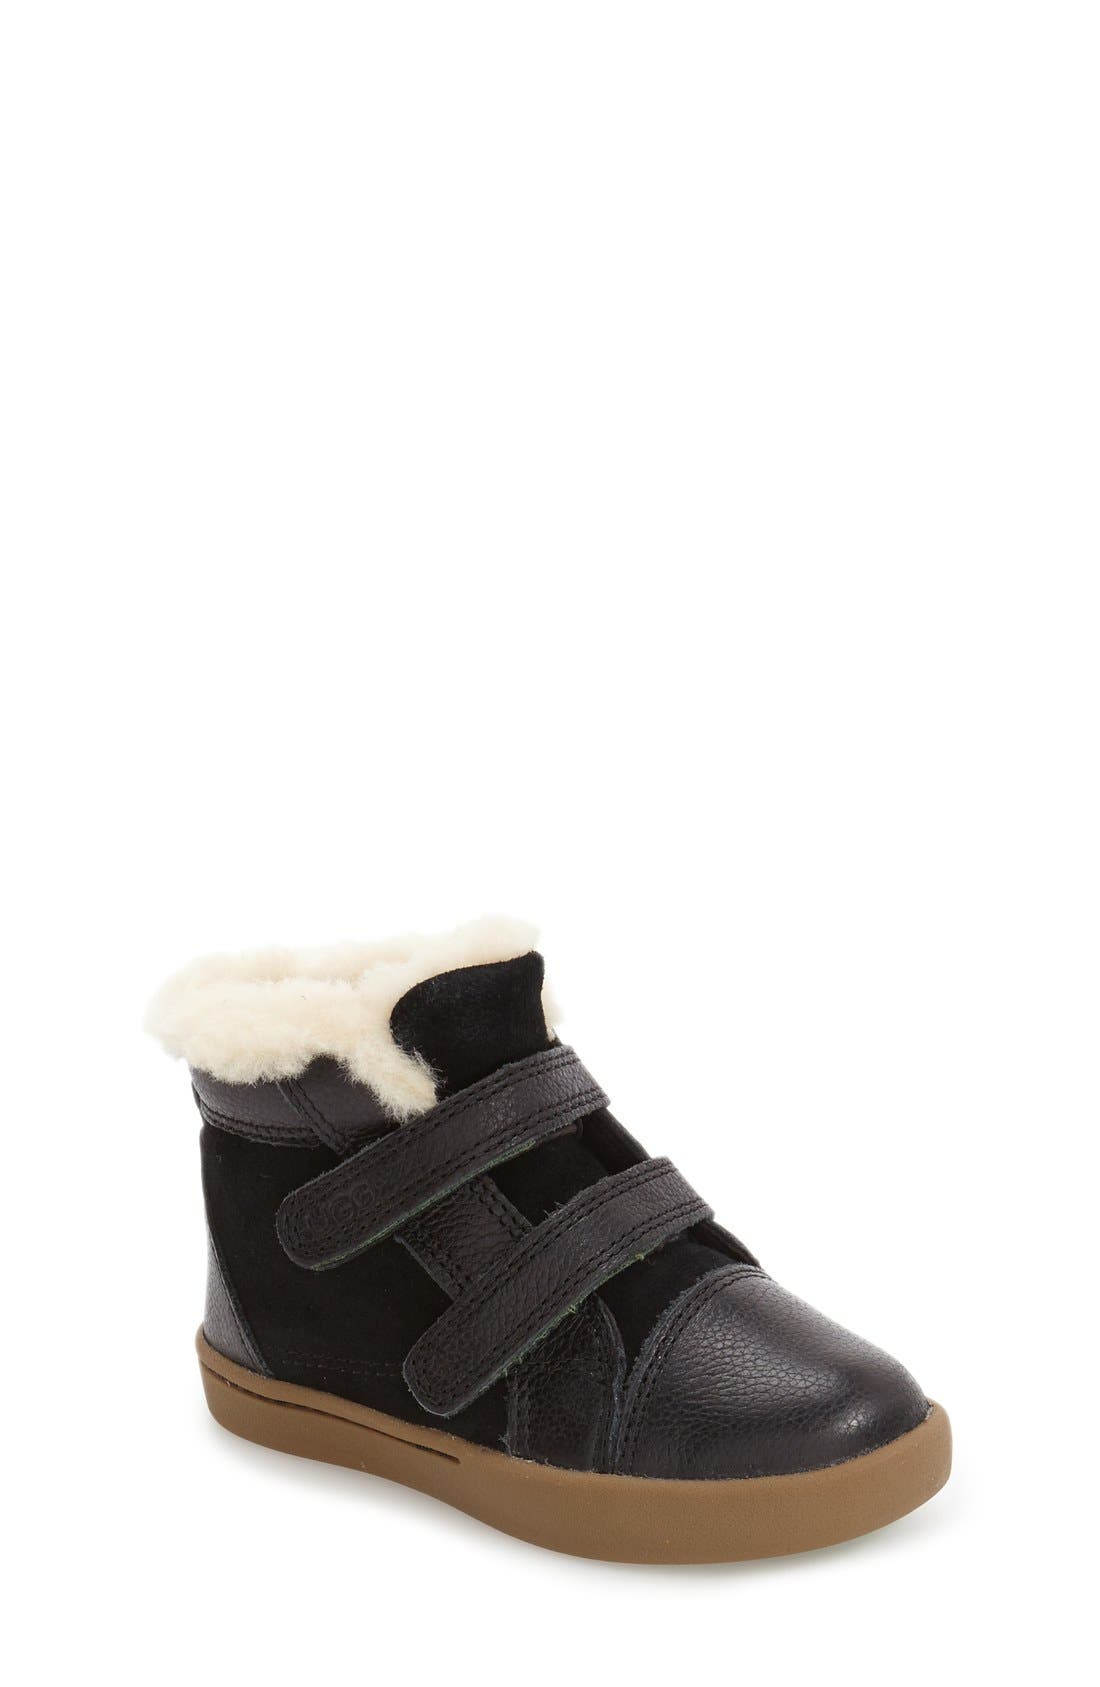 Rennon High Top Sneaker,                         Main,                         color, 001